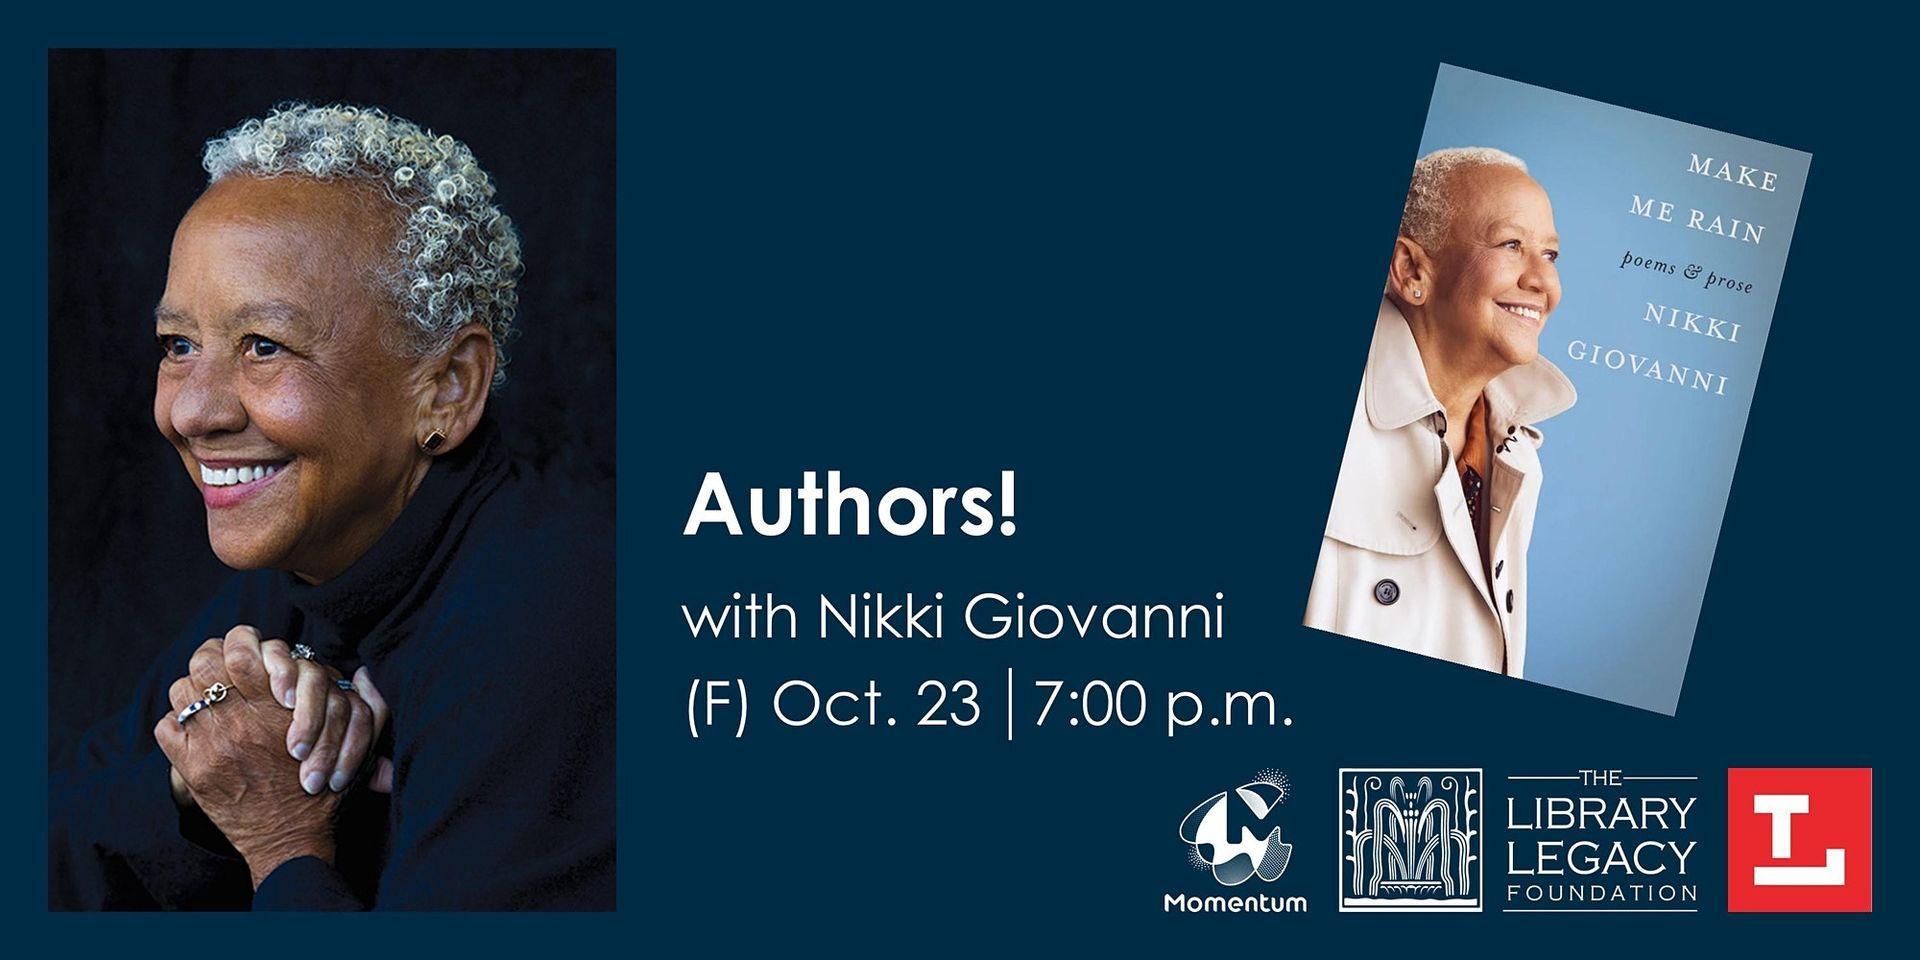 Authors-with-Nikki-Giovanni.jpg#asset:4405